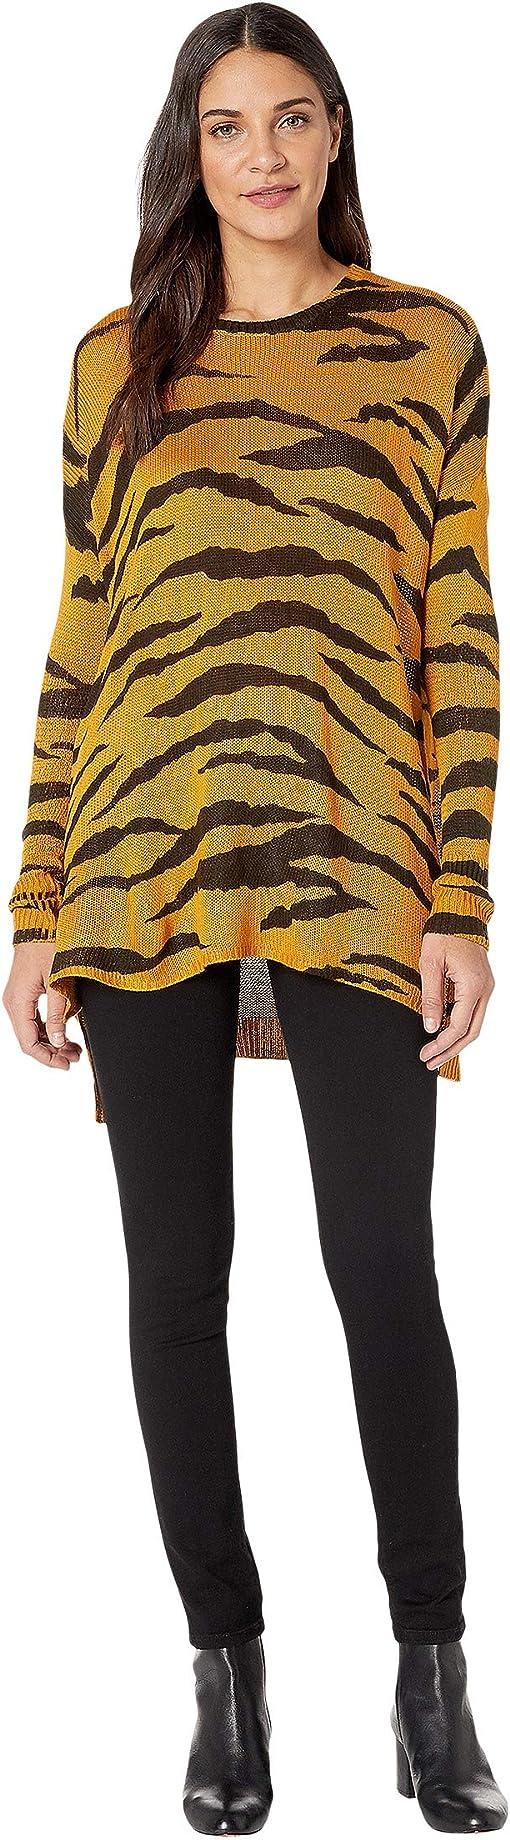 Great Tiger Knit